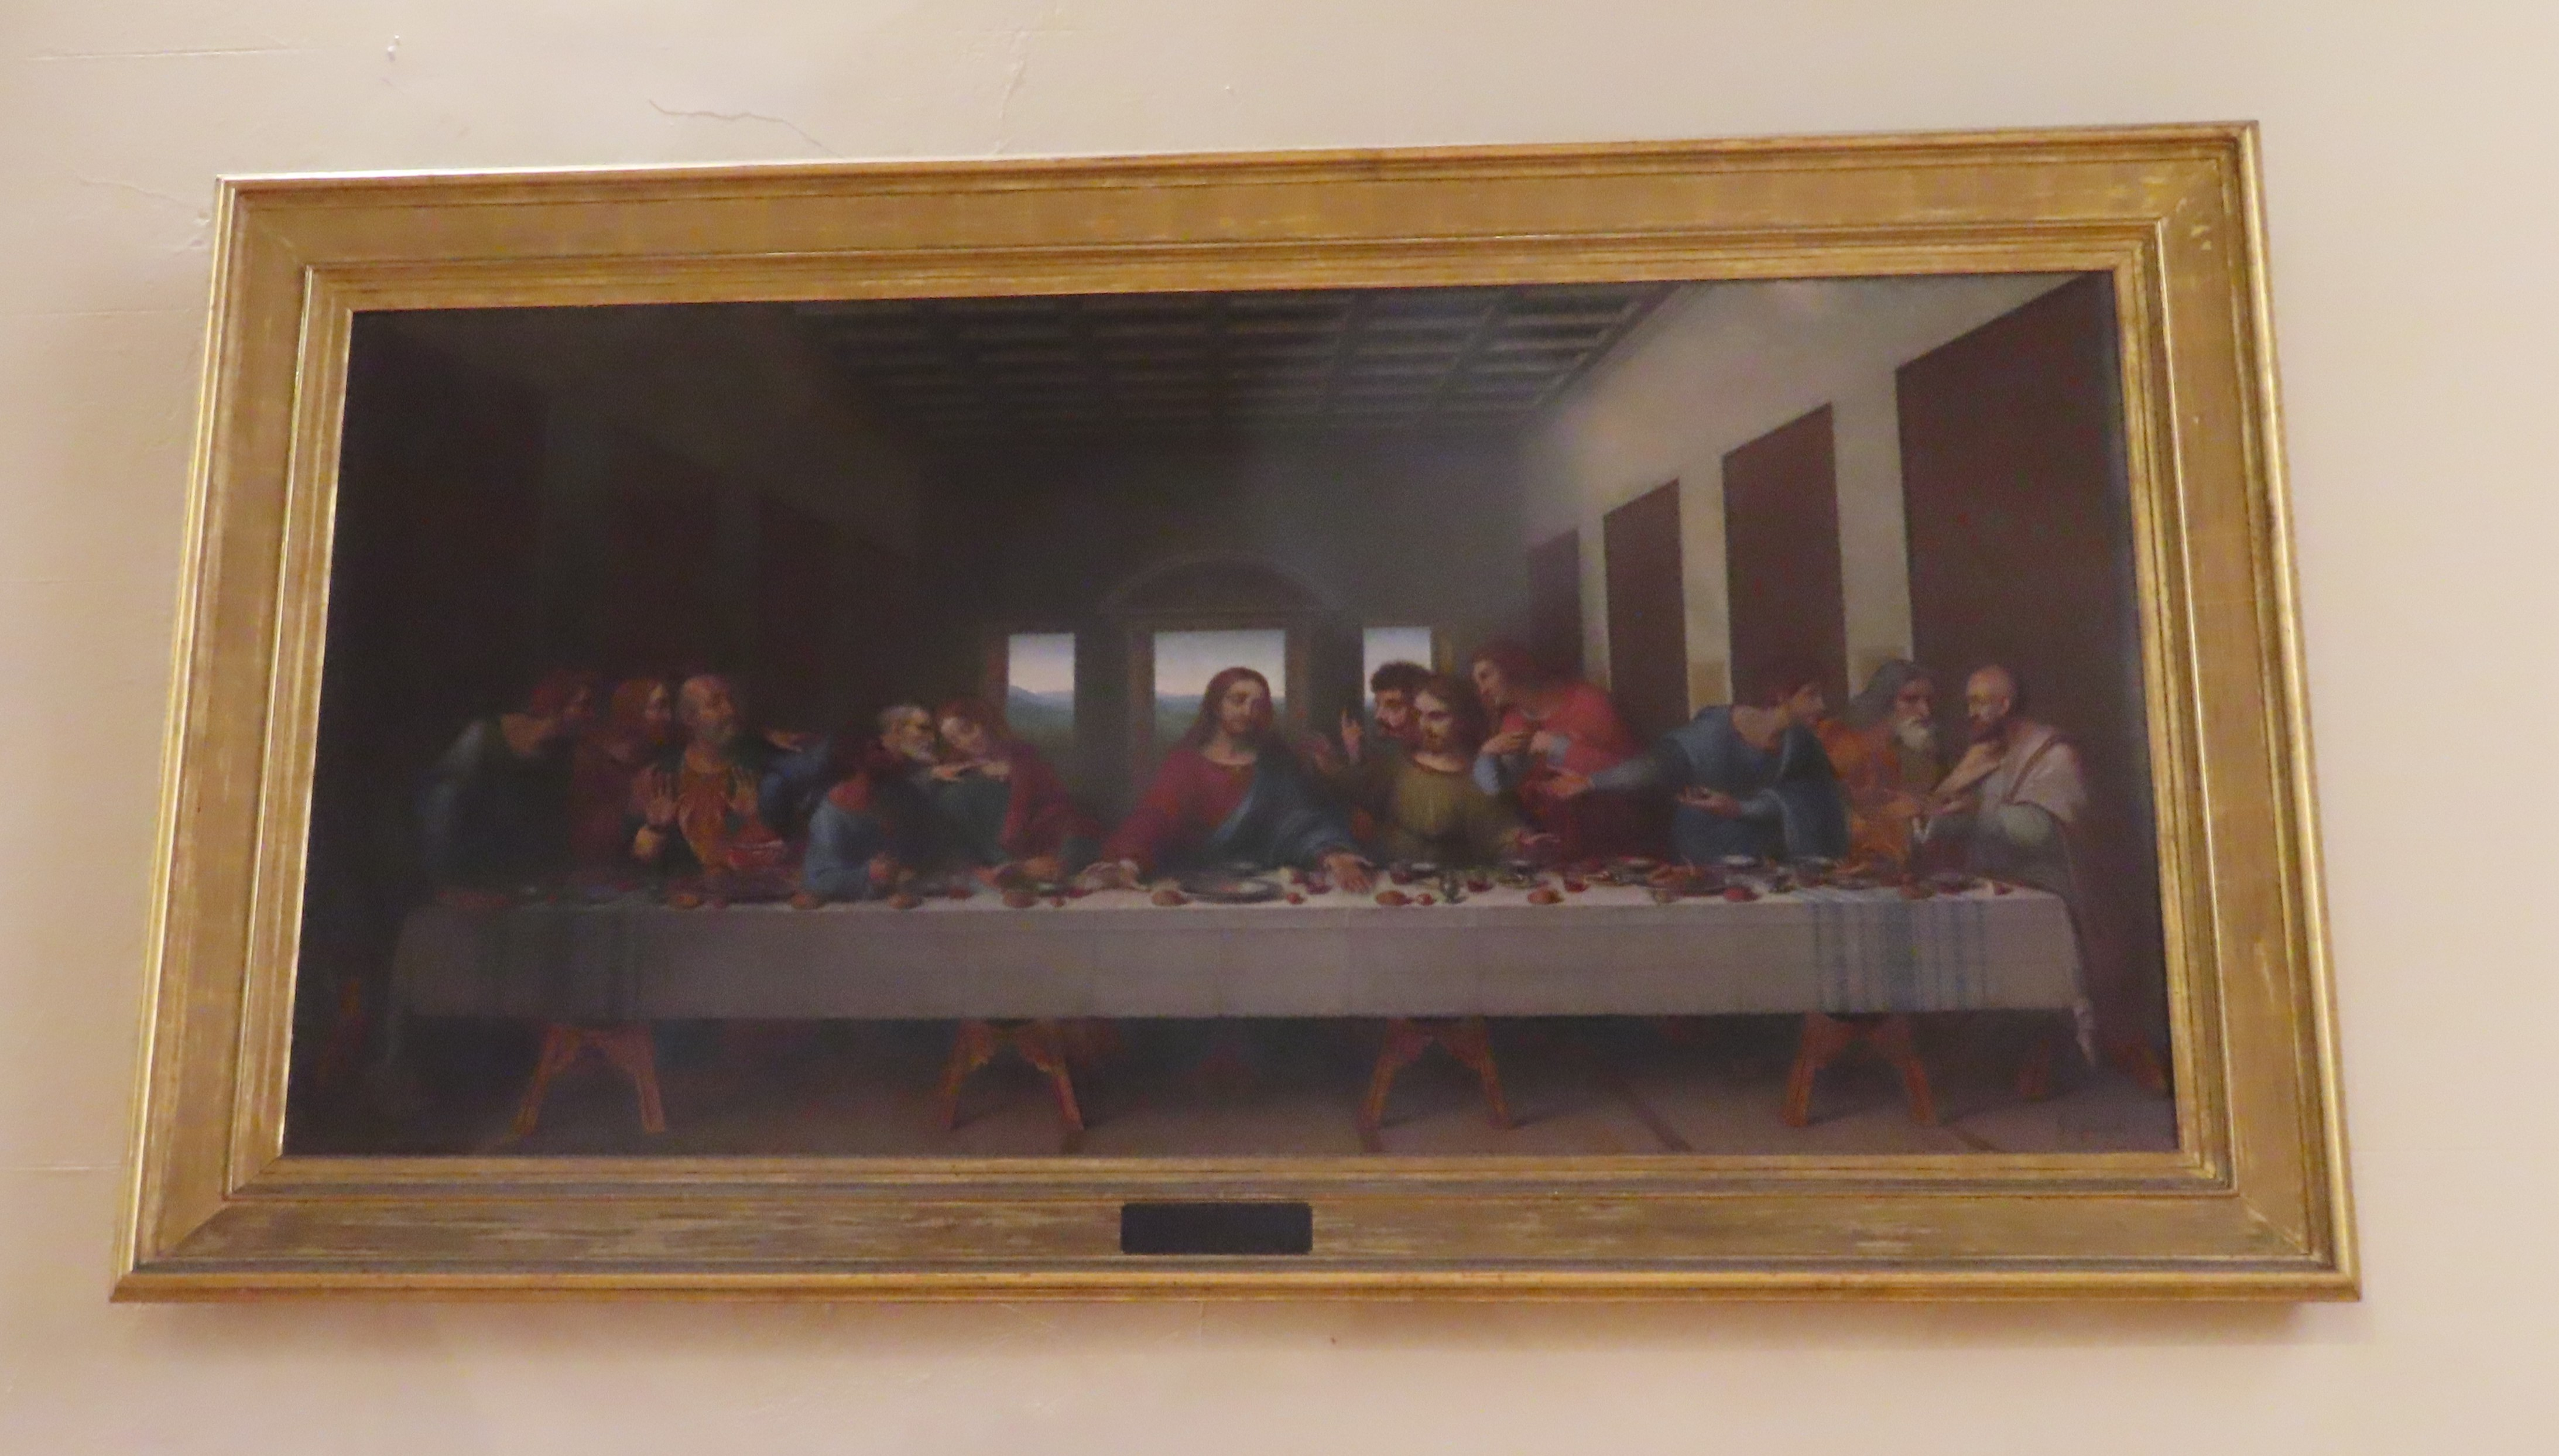 St Peters Glenelg Last Supper 20191030